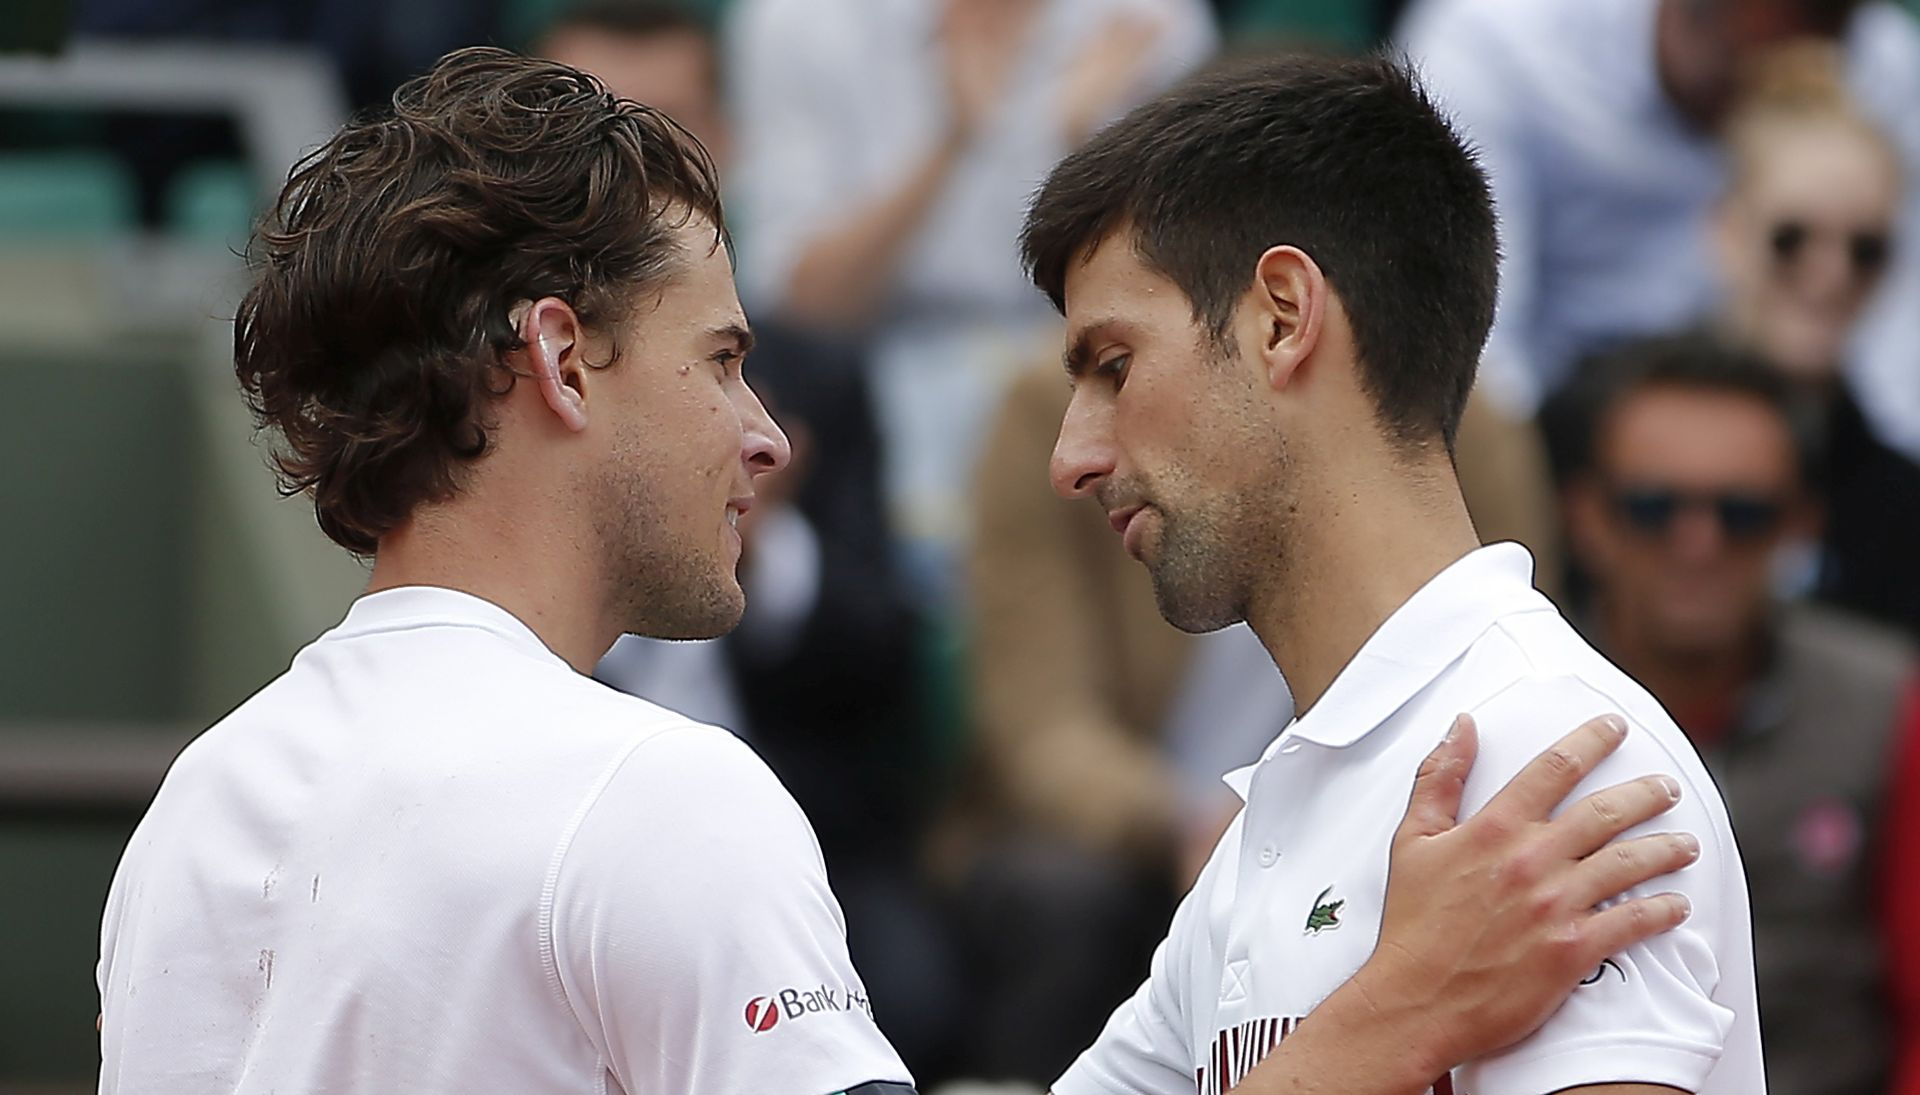 ROLAND GARROS Thiem izbacio Đokovića, za finale protiv Nadala